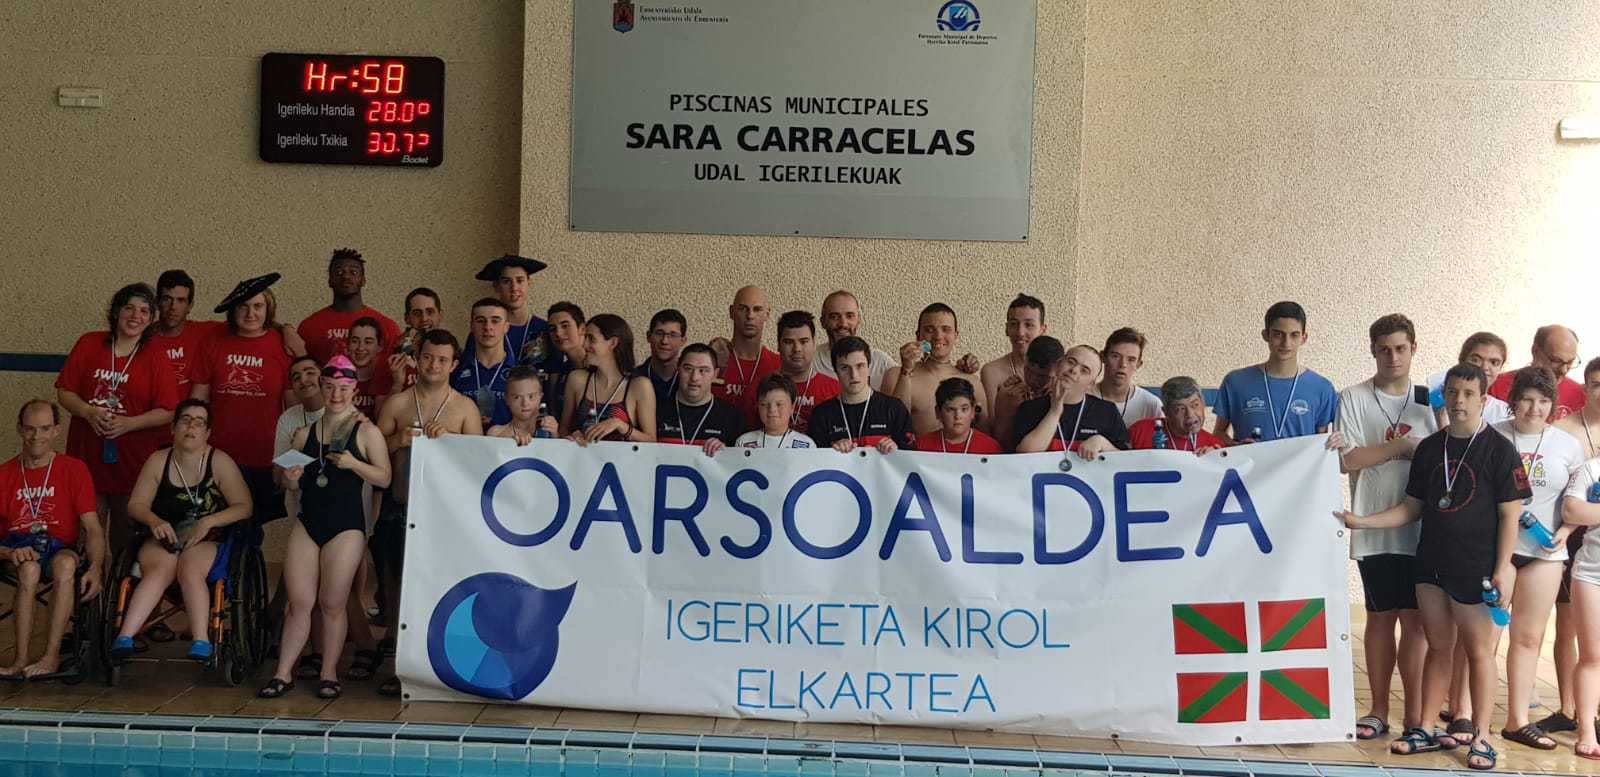 Konporta gana por equipos el XI trofeo Sara Carracelas - Konporta